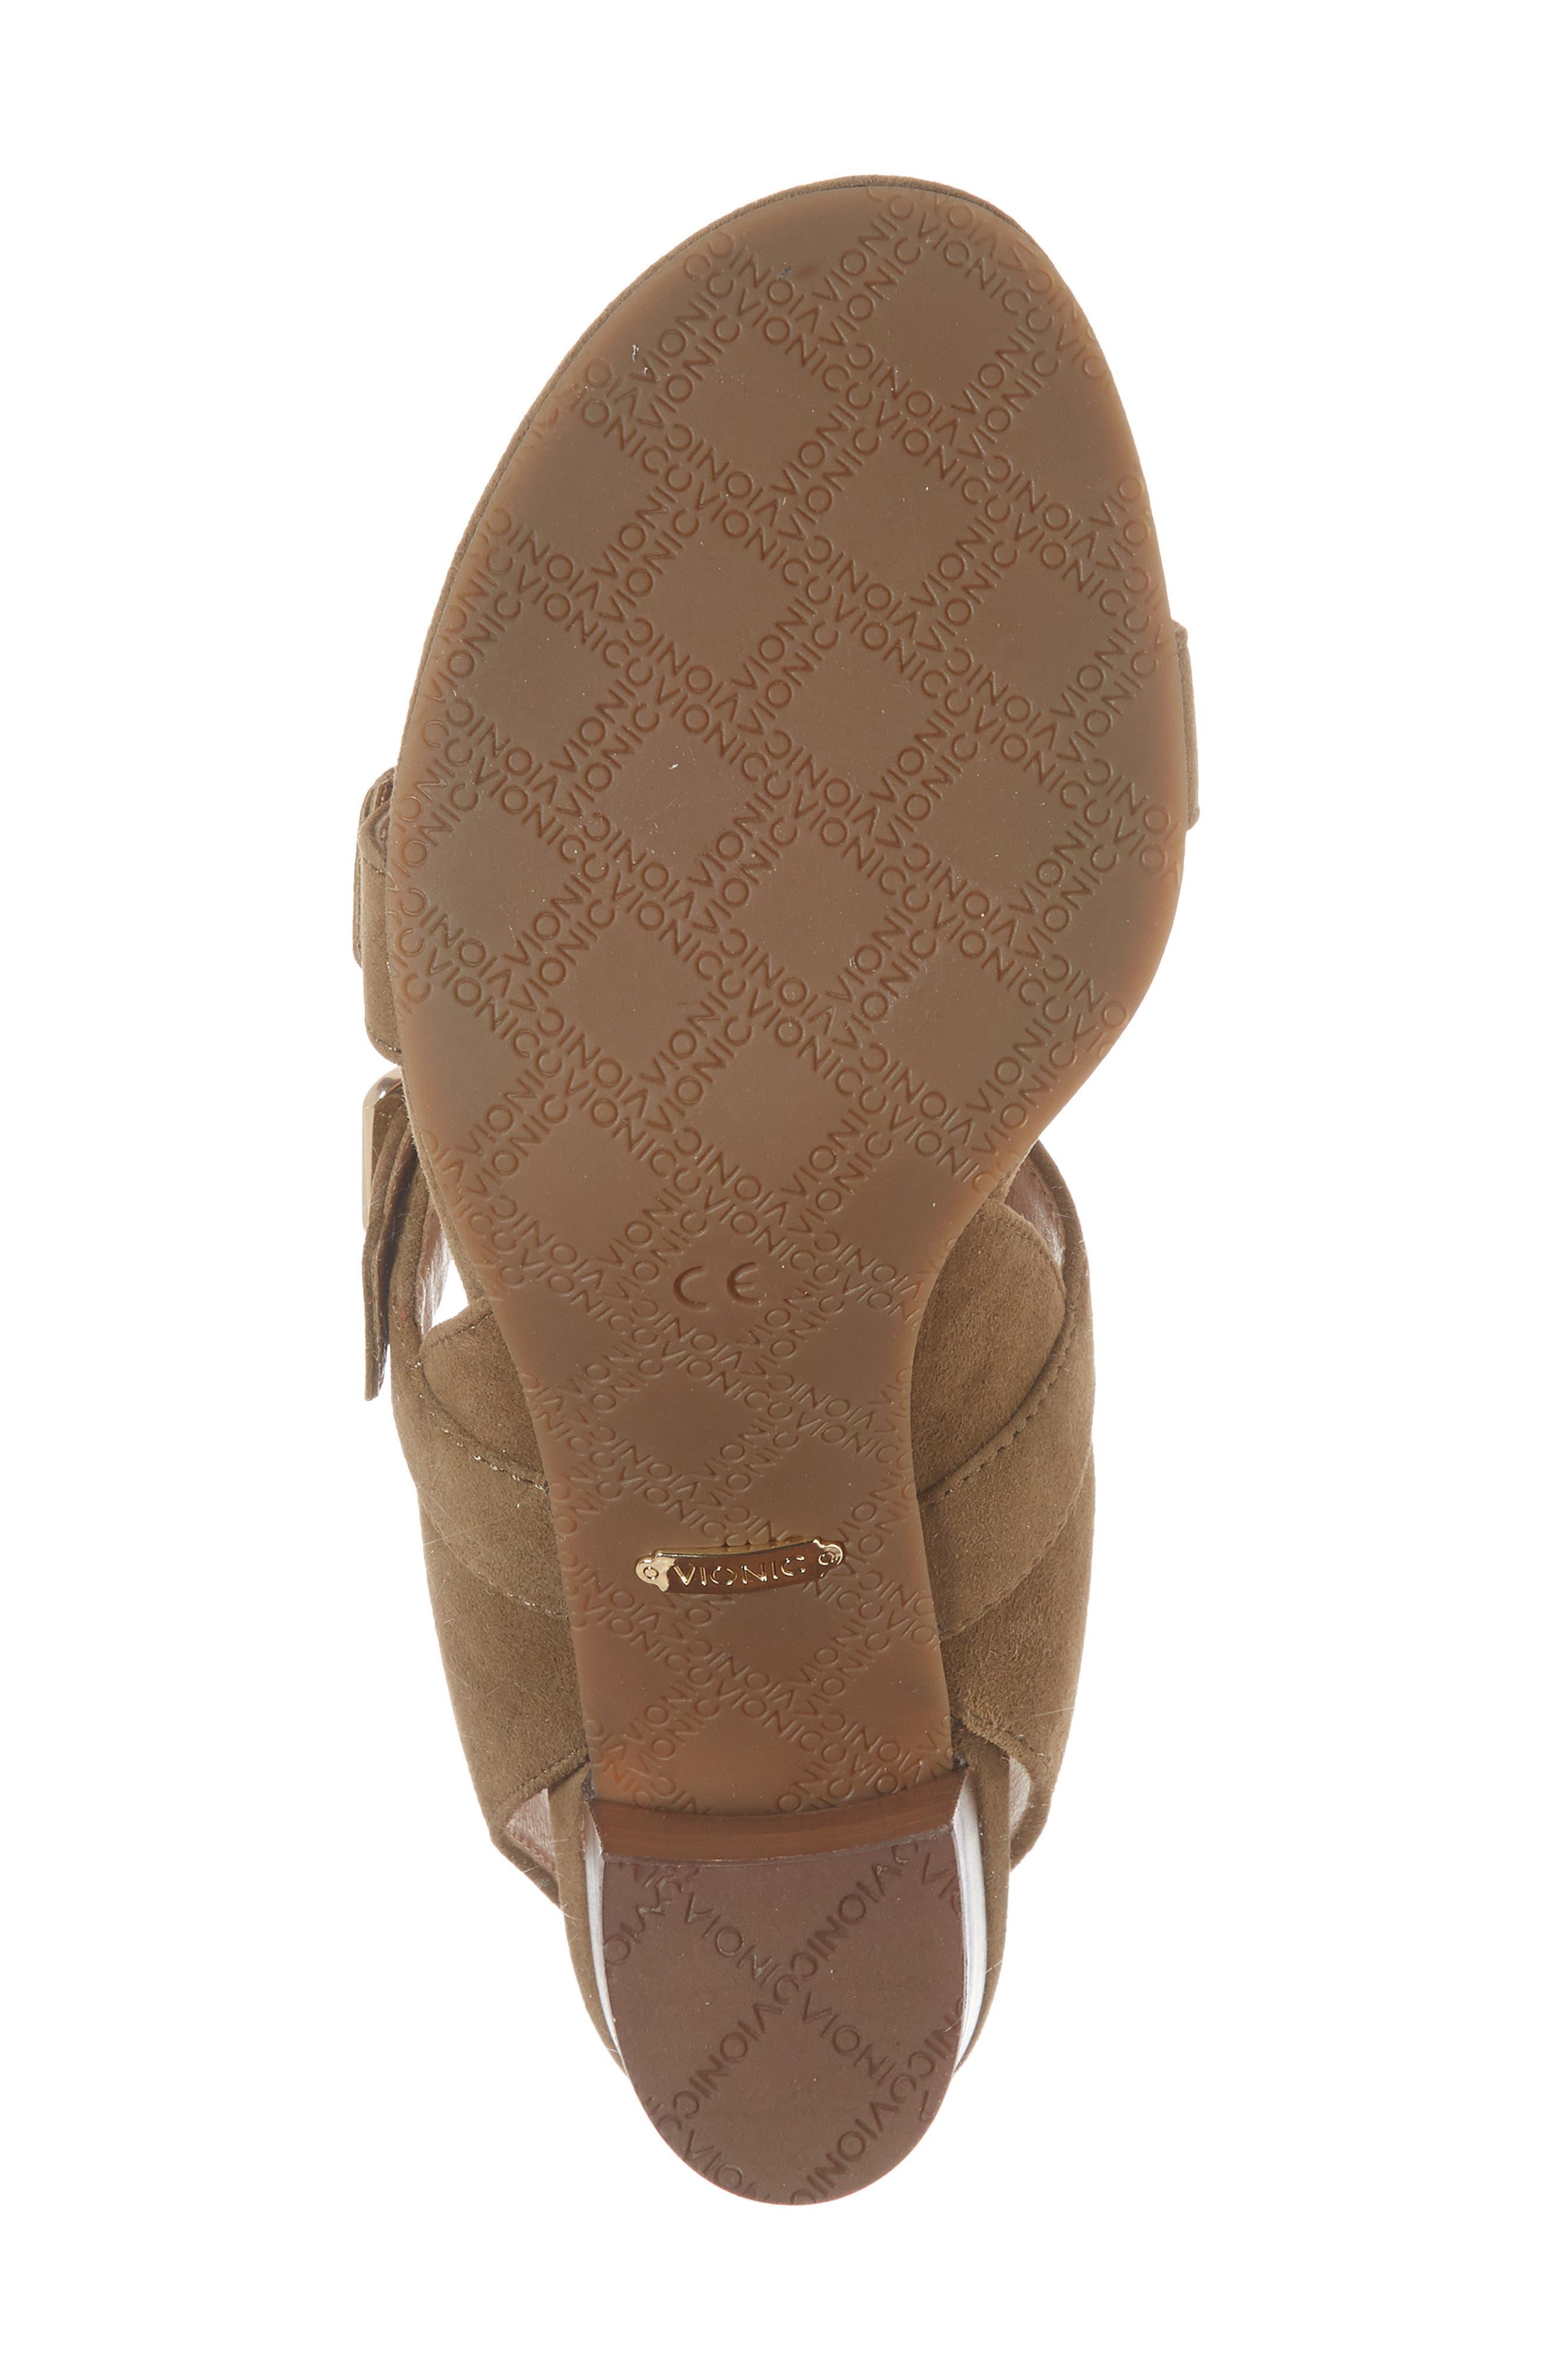 Carmel Block Heel Sandal,                             Alternate thumbnail 6, color,                             310